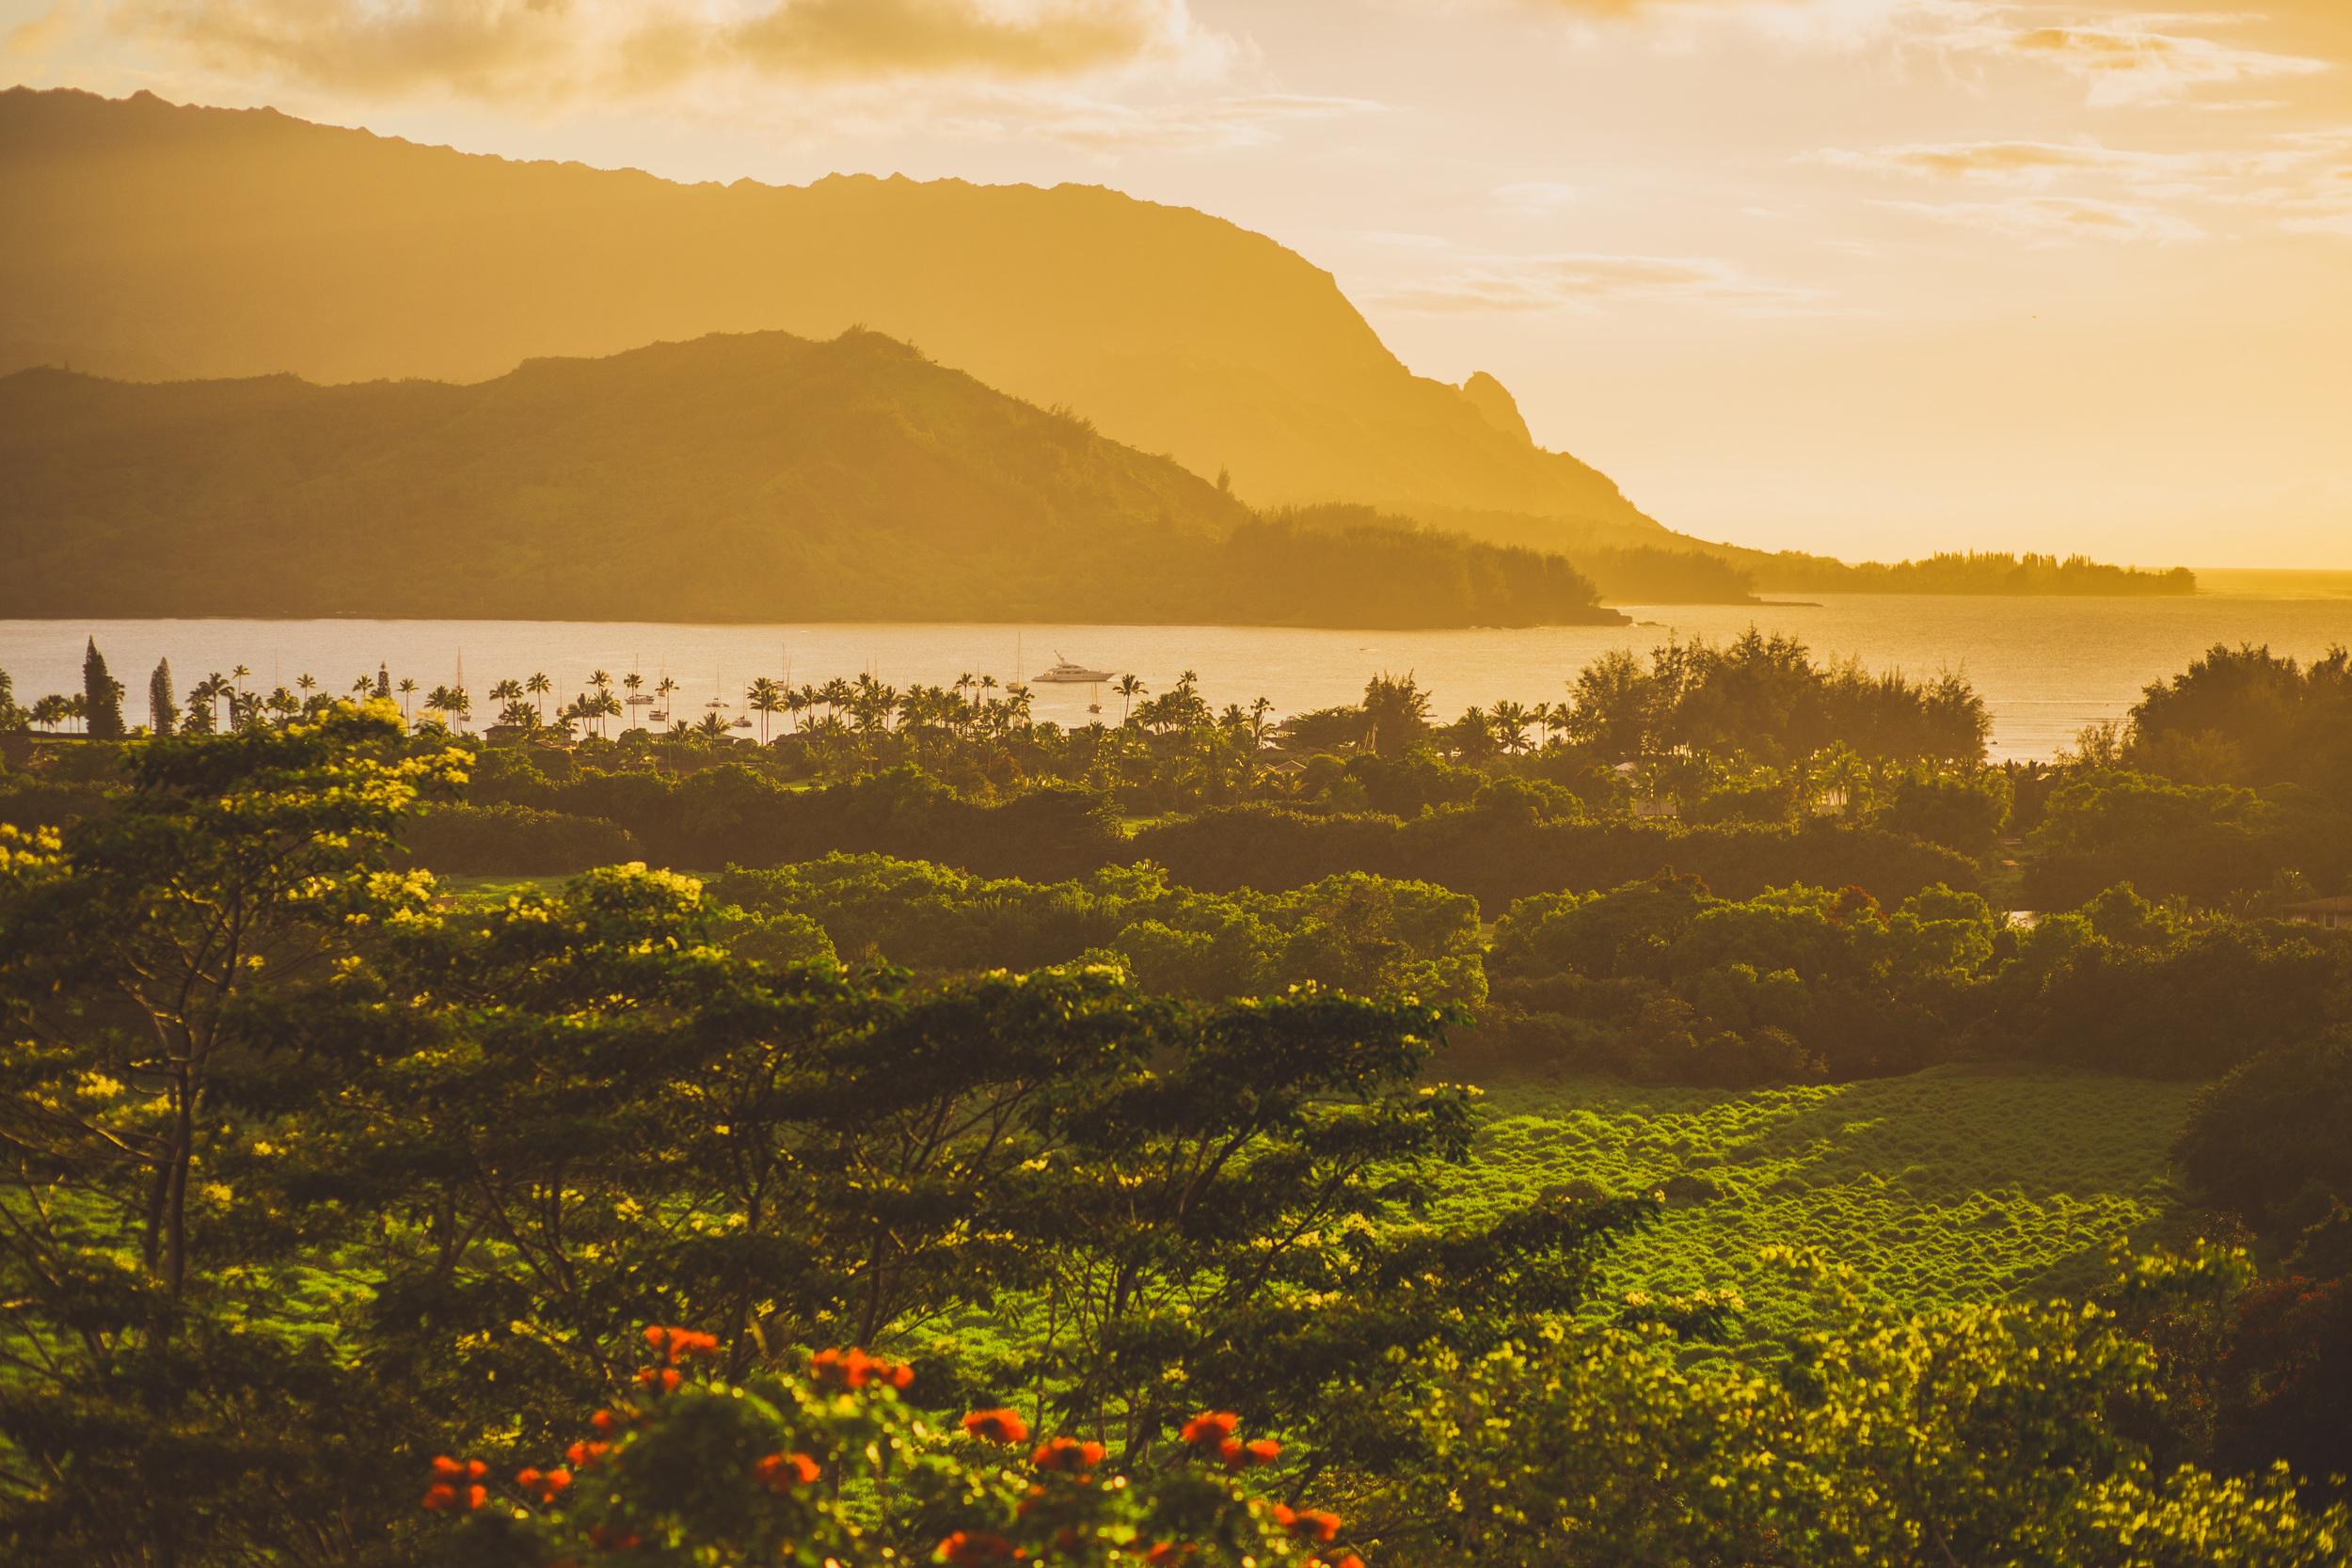 IMG_2780 KAUAI GOLDEN HOUR SUNSET JENNIFER PICARD PHOTOGRAPHY.jpg